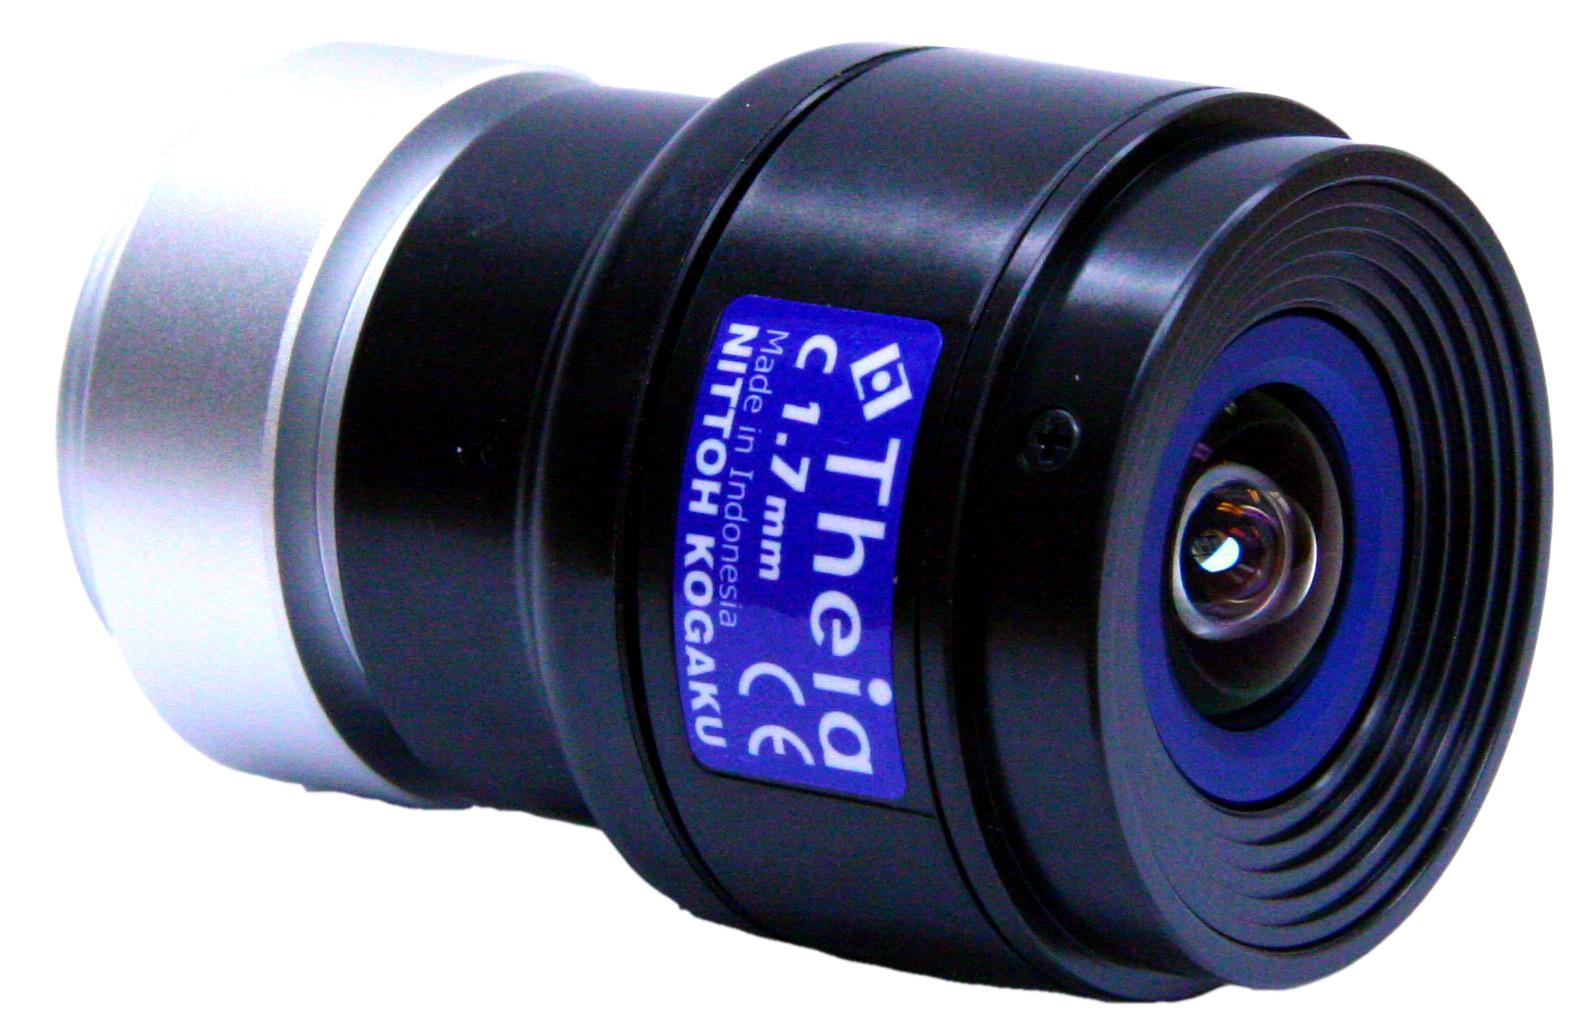 Theia MY110M lens